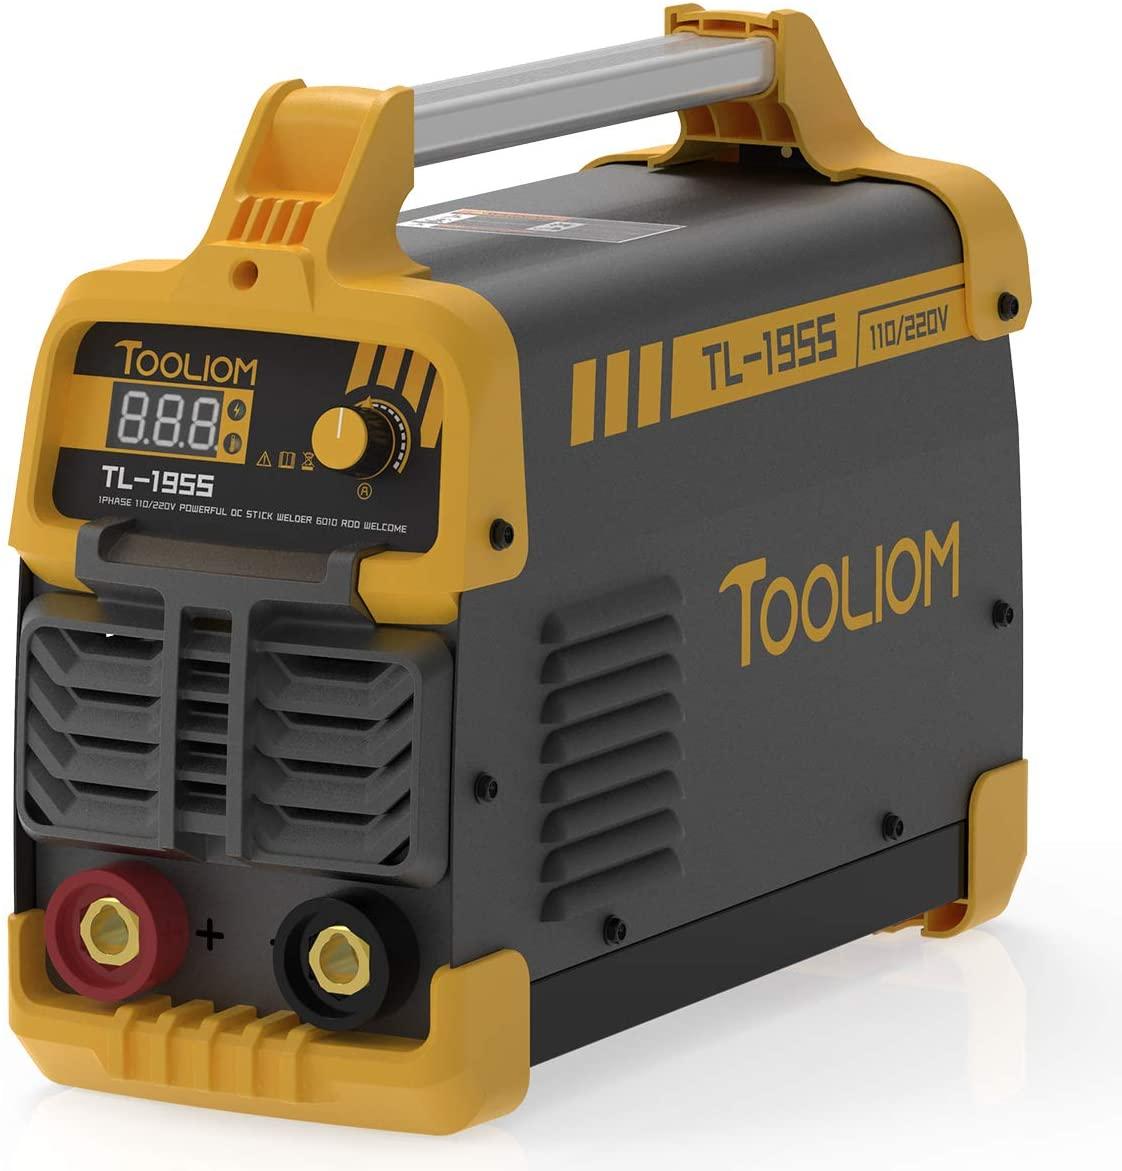 TOOLIOM 195A 120/230V Stick Welder ARC Welding Machine DC Inverter Dual Voltage MMA Welder Digital Display with 50A Adapter